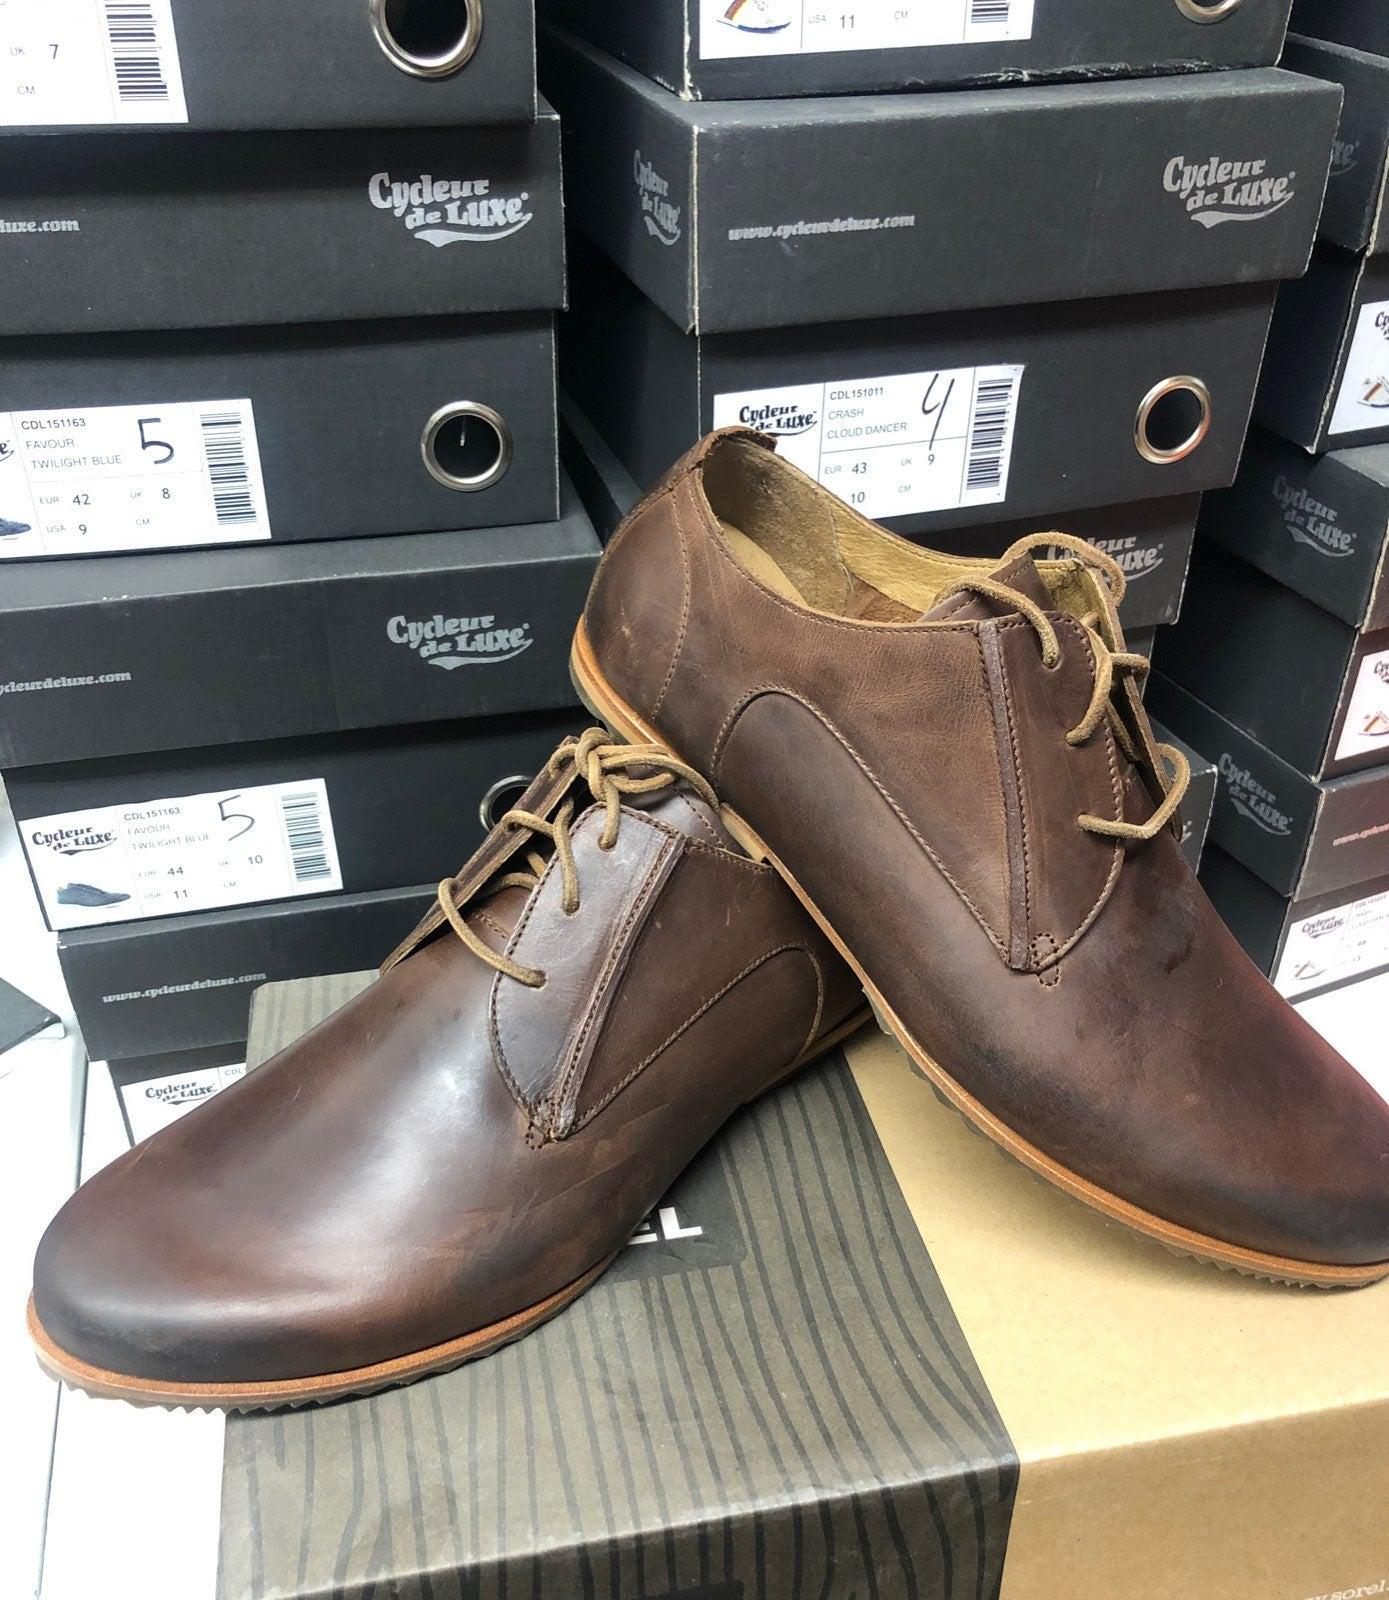 SOREL Shoes for men's brown flat shoe